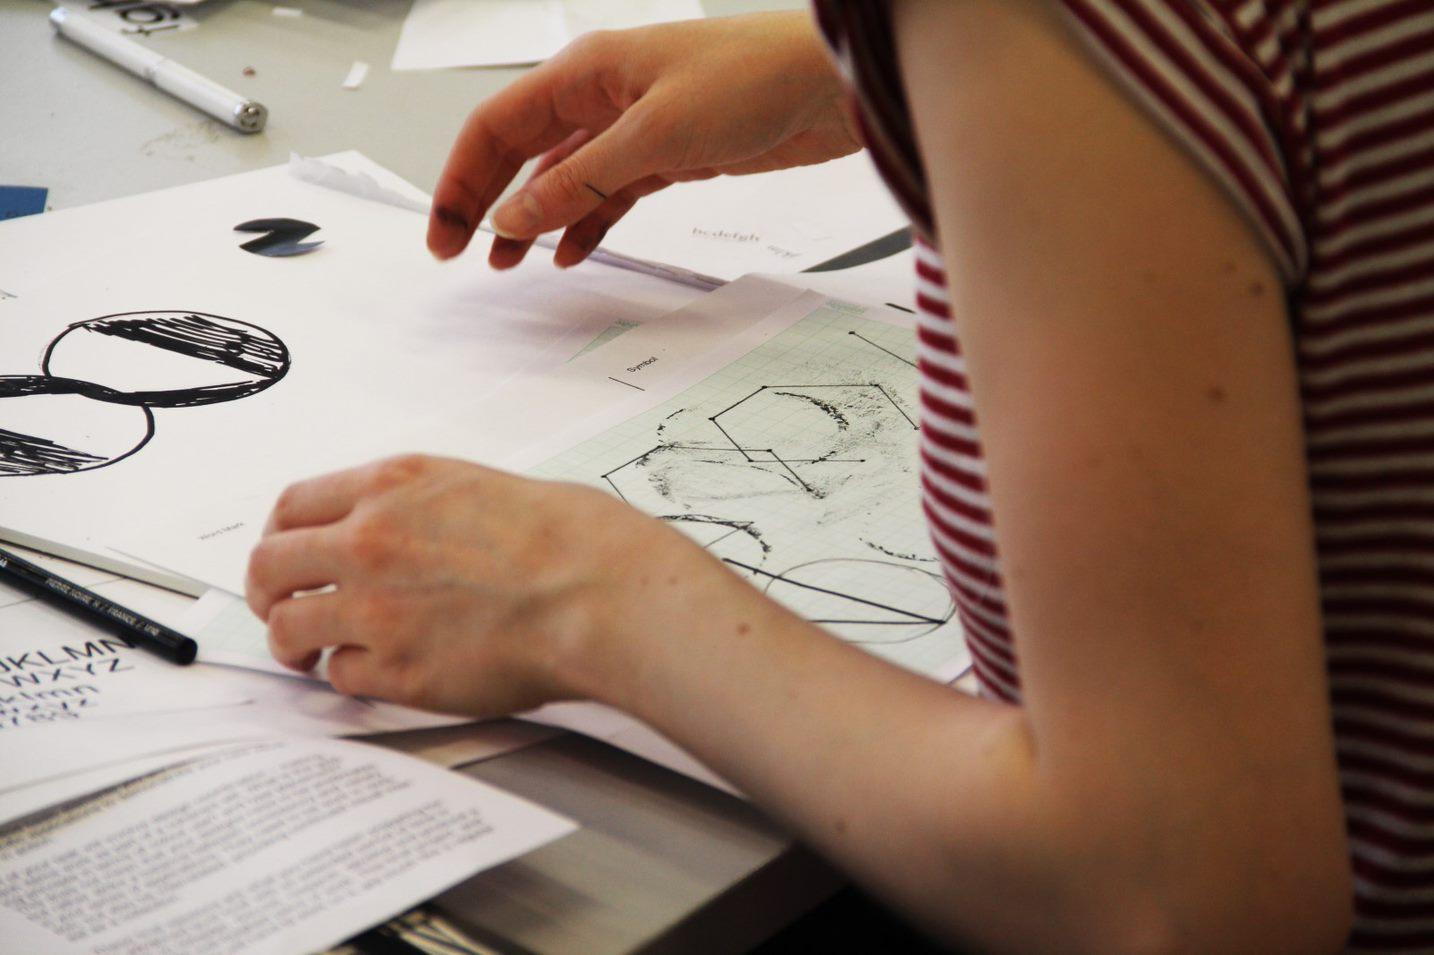 Graphic Design - Beginners